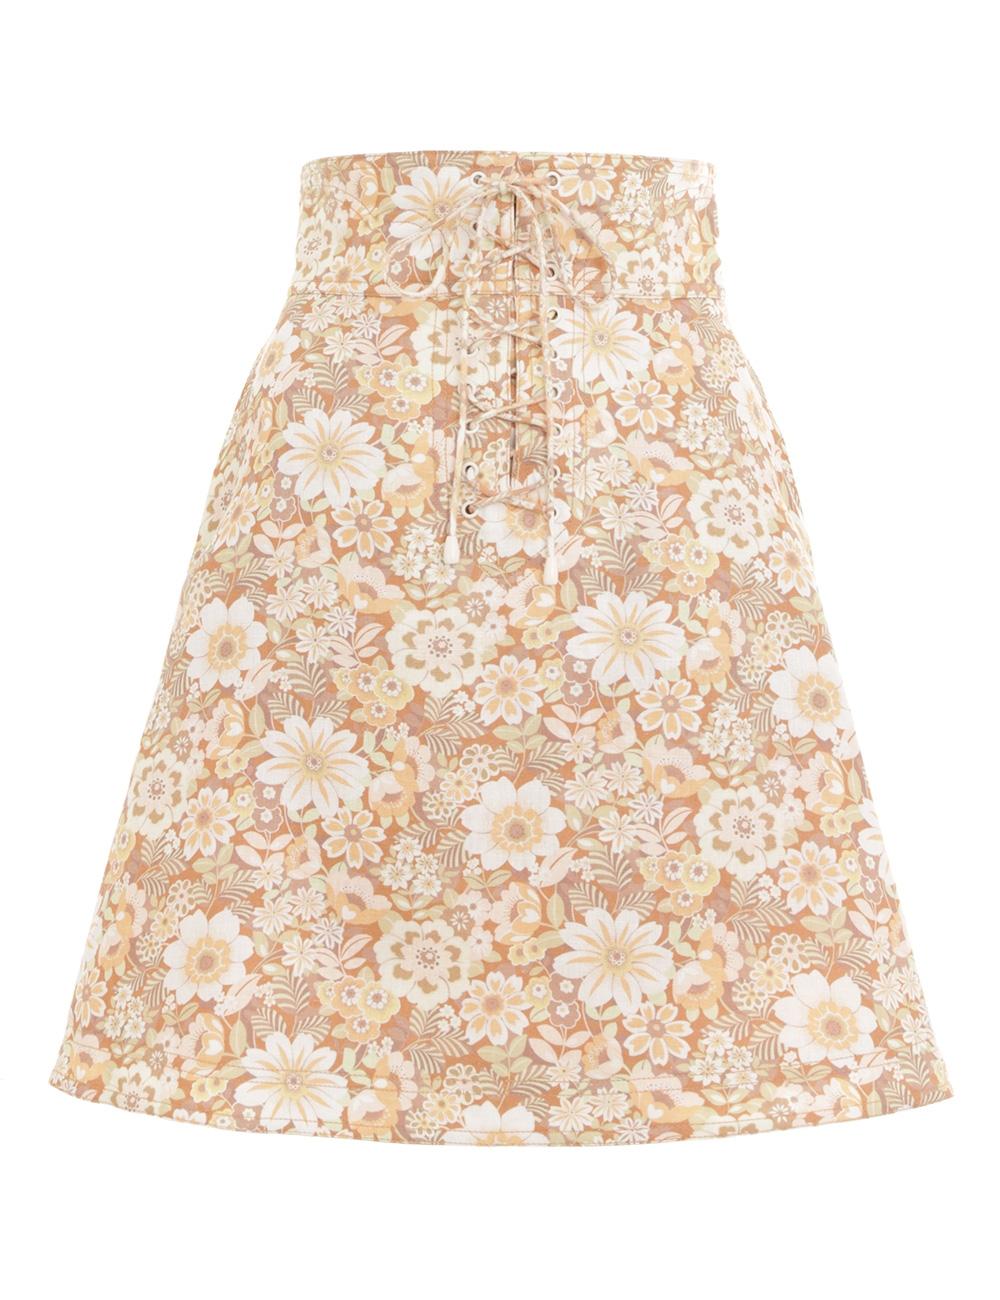 Zippy Lace Up Skirt